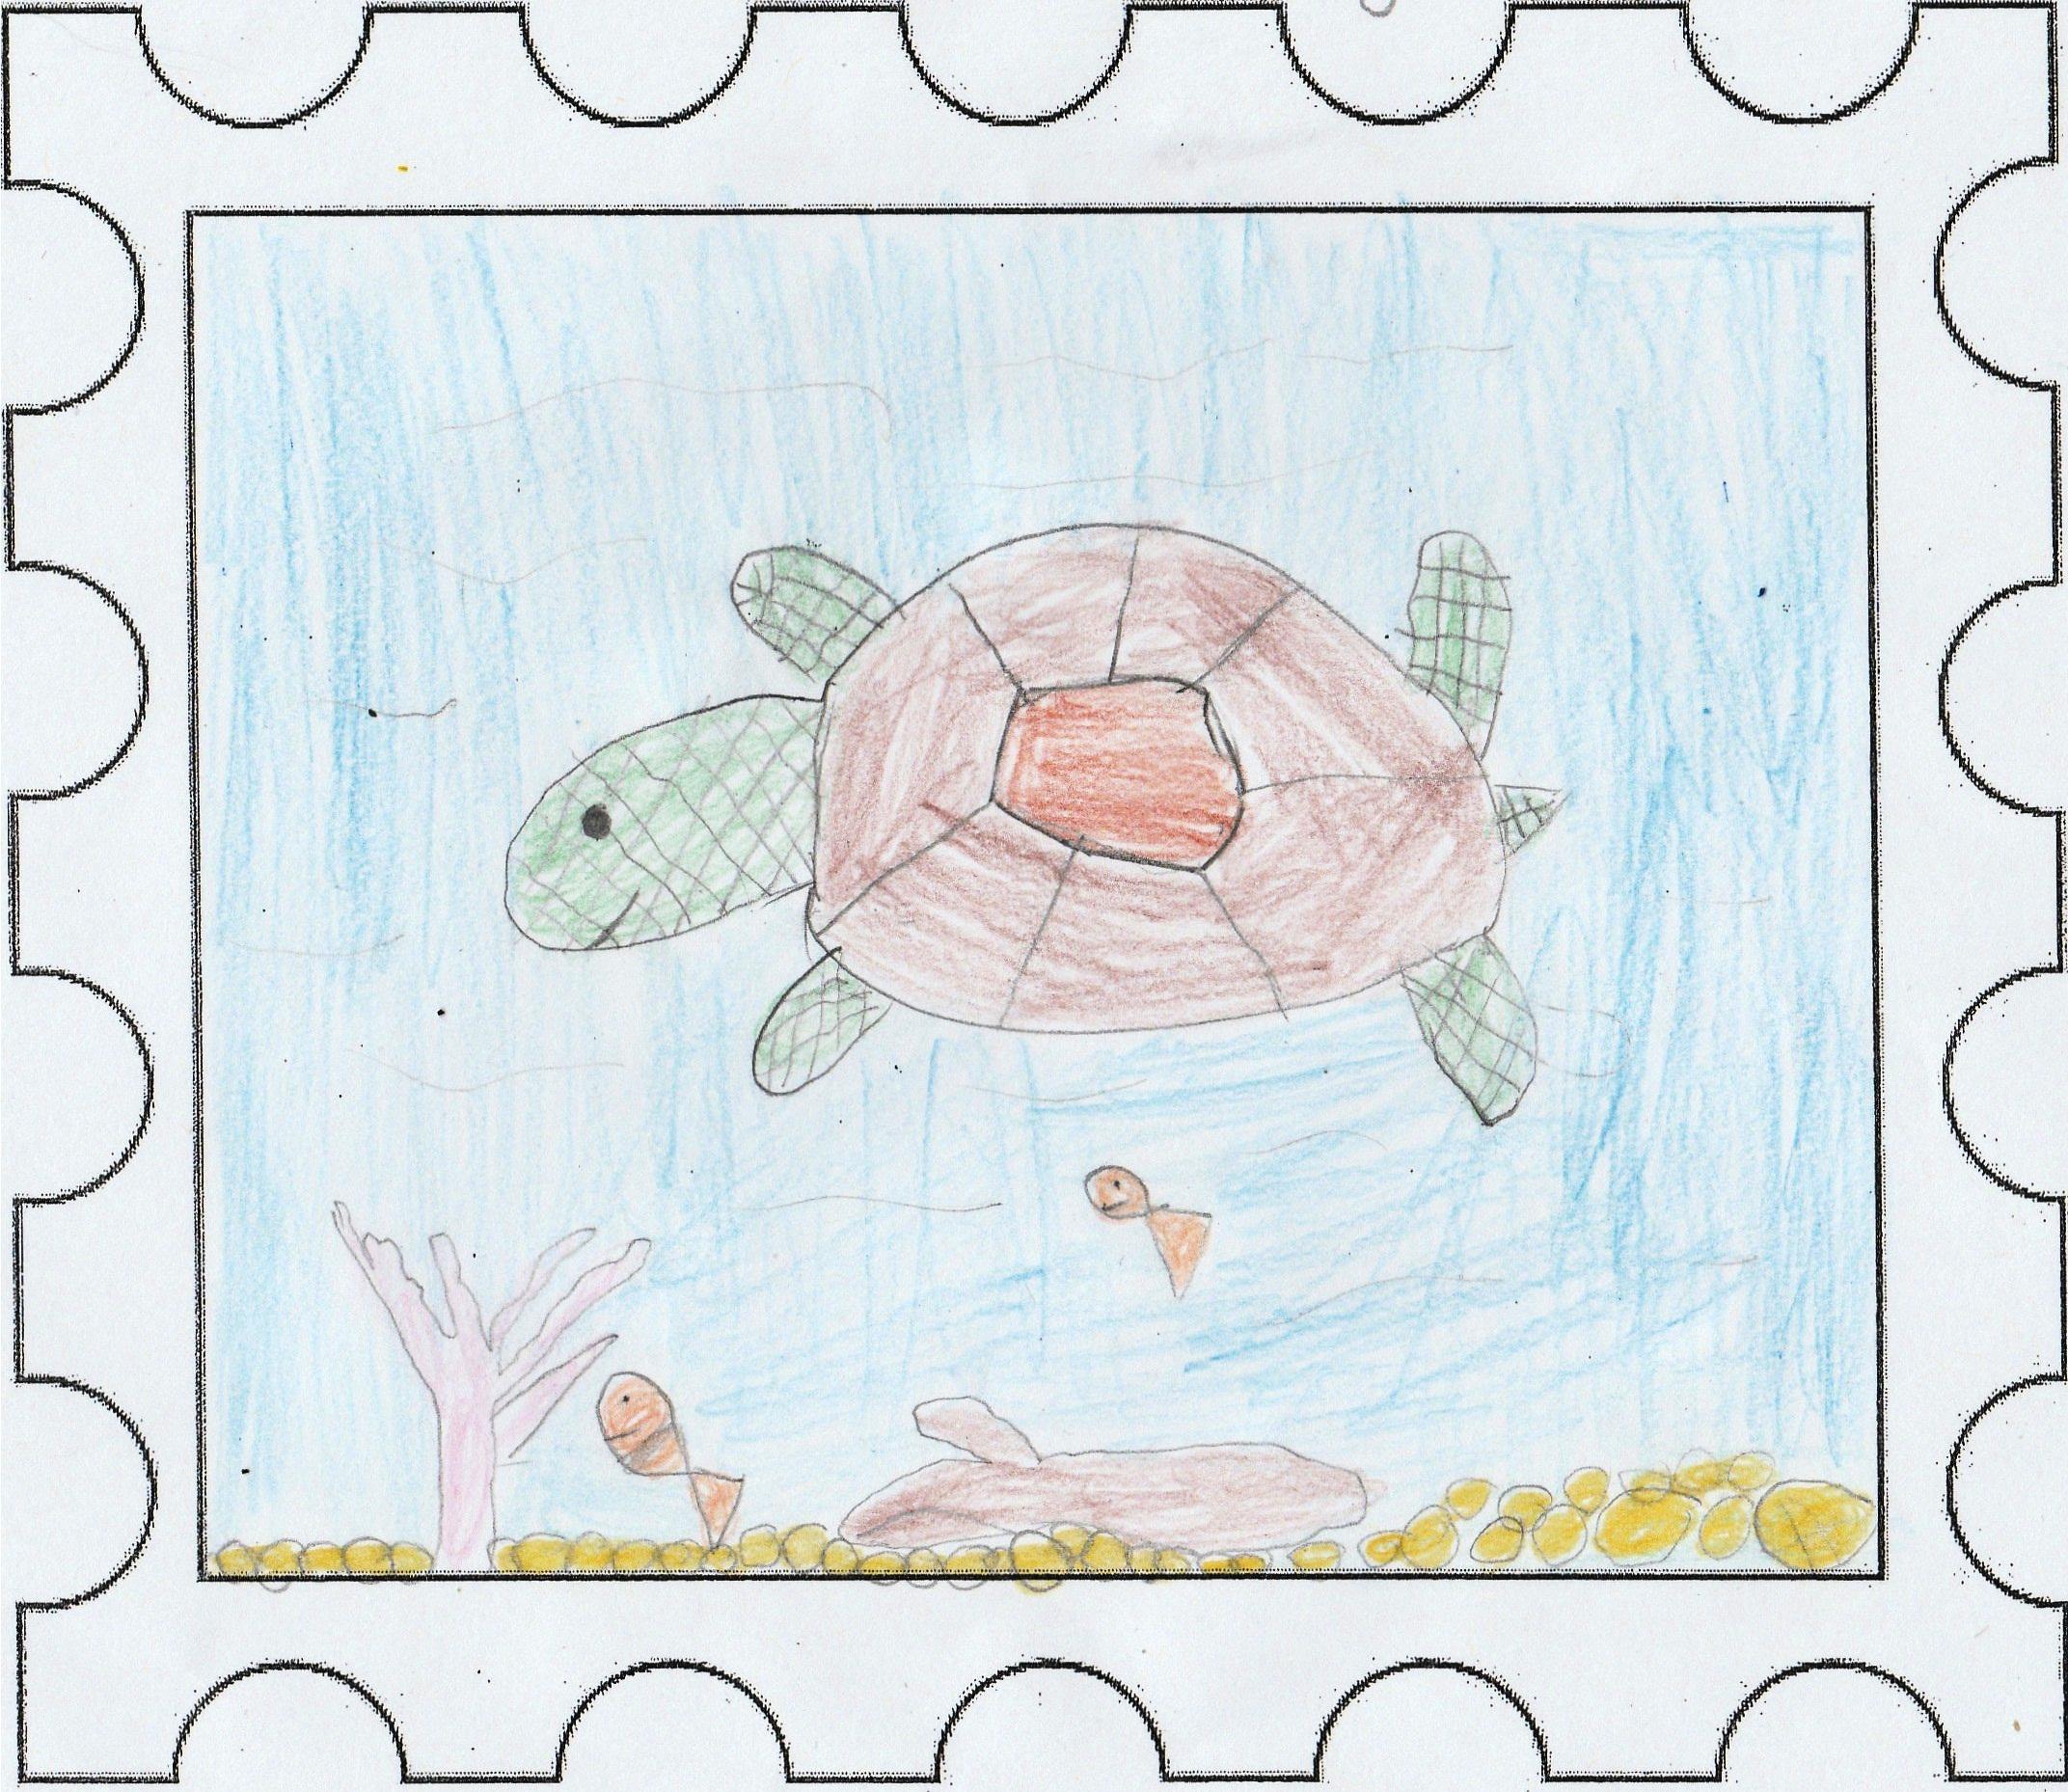 La tortue voyageuse